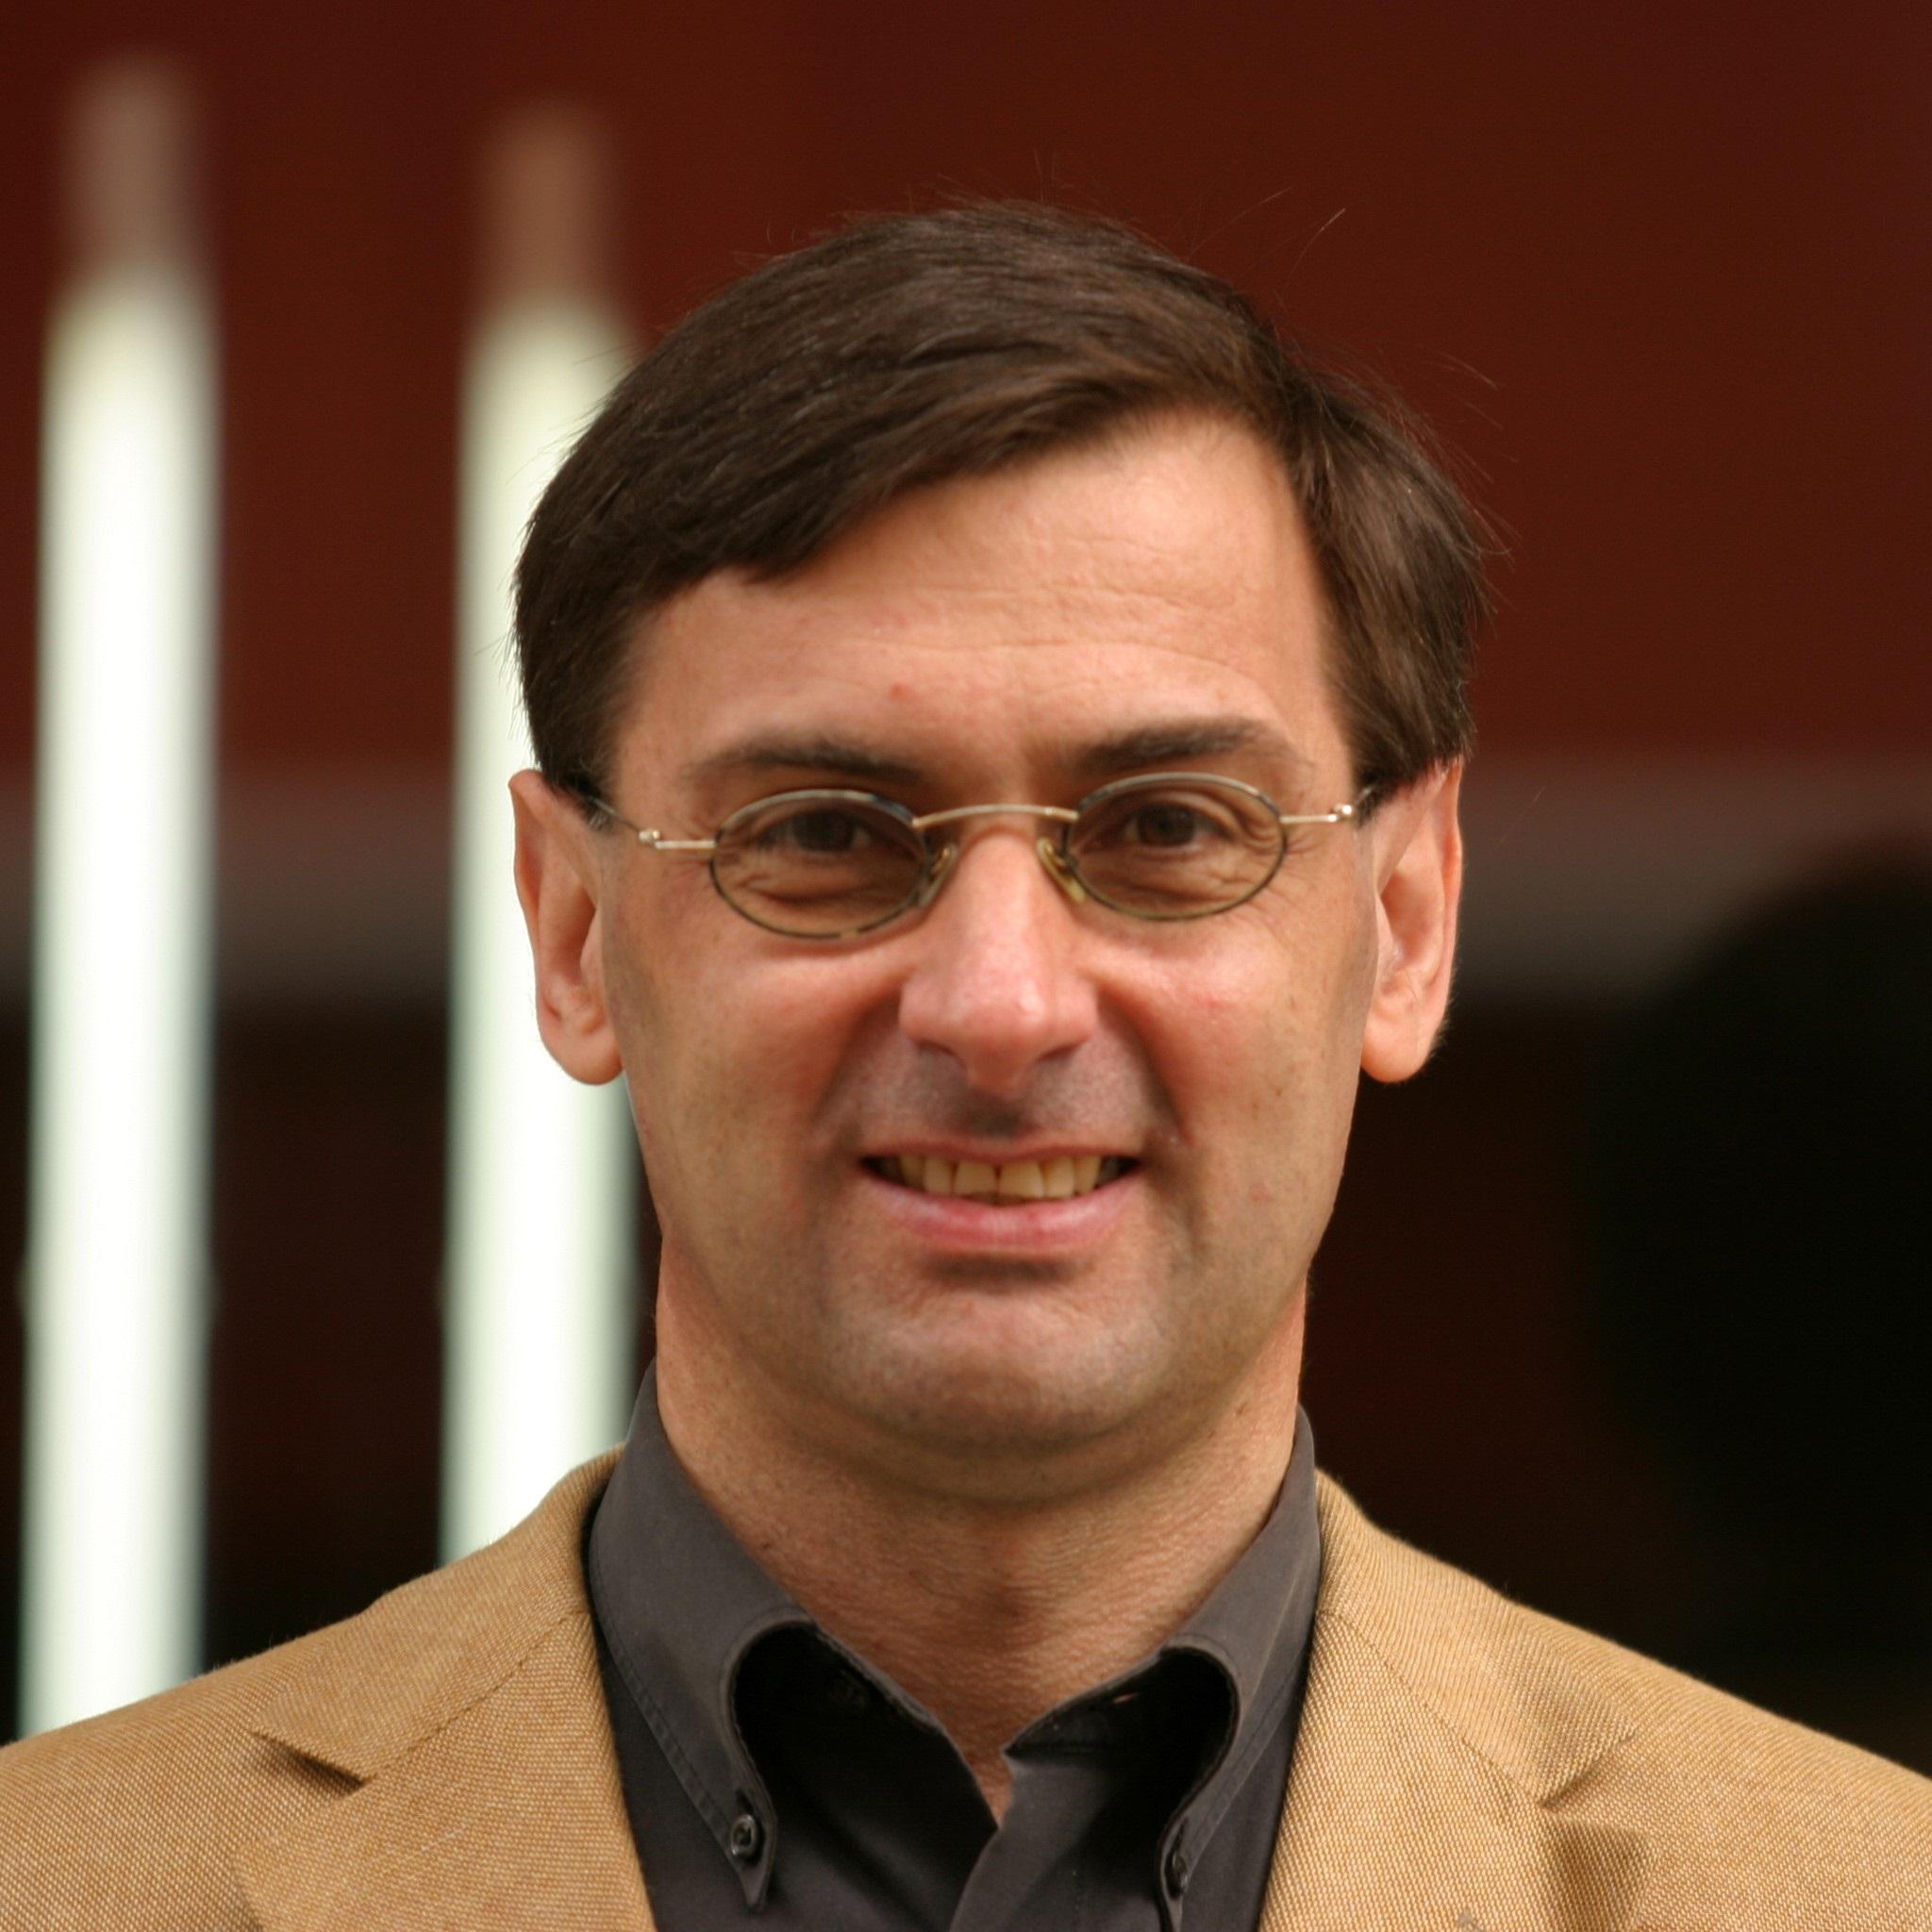 Hermann Hofbauer Profilbild